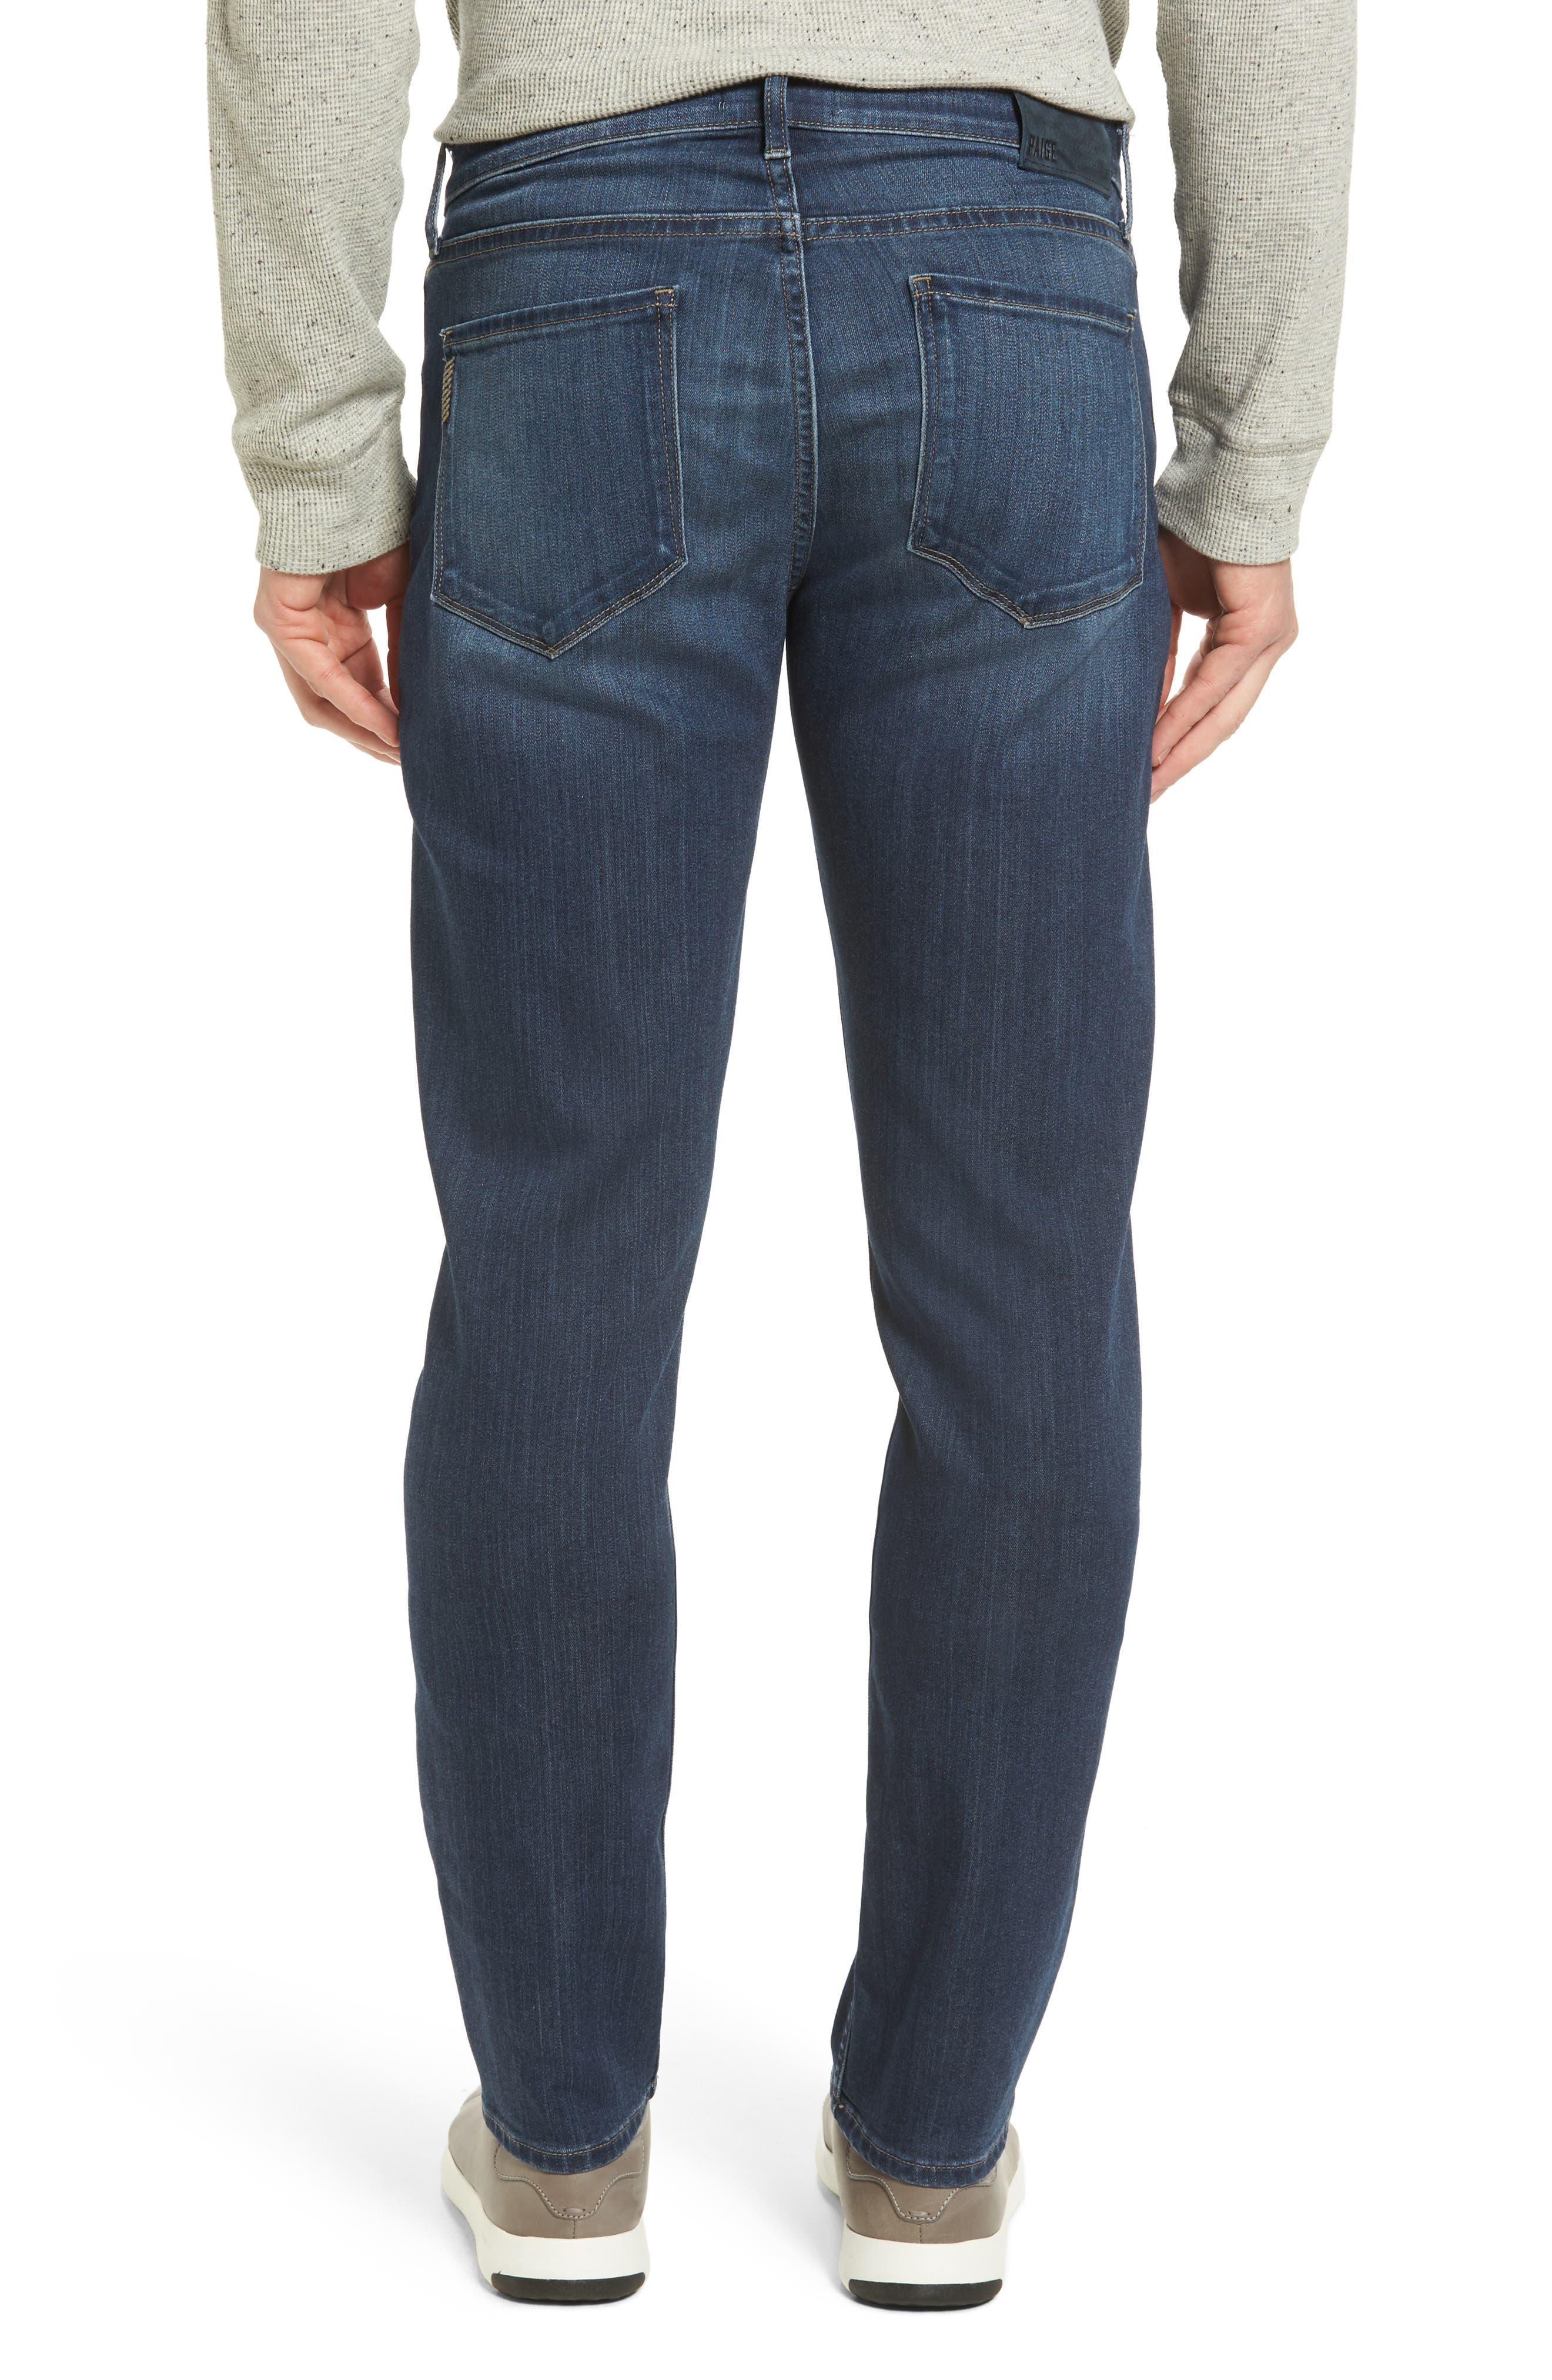 Transcend - Federal Slim Straight Leg Jeans,                             Alternate thumbnail 2, color,